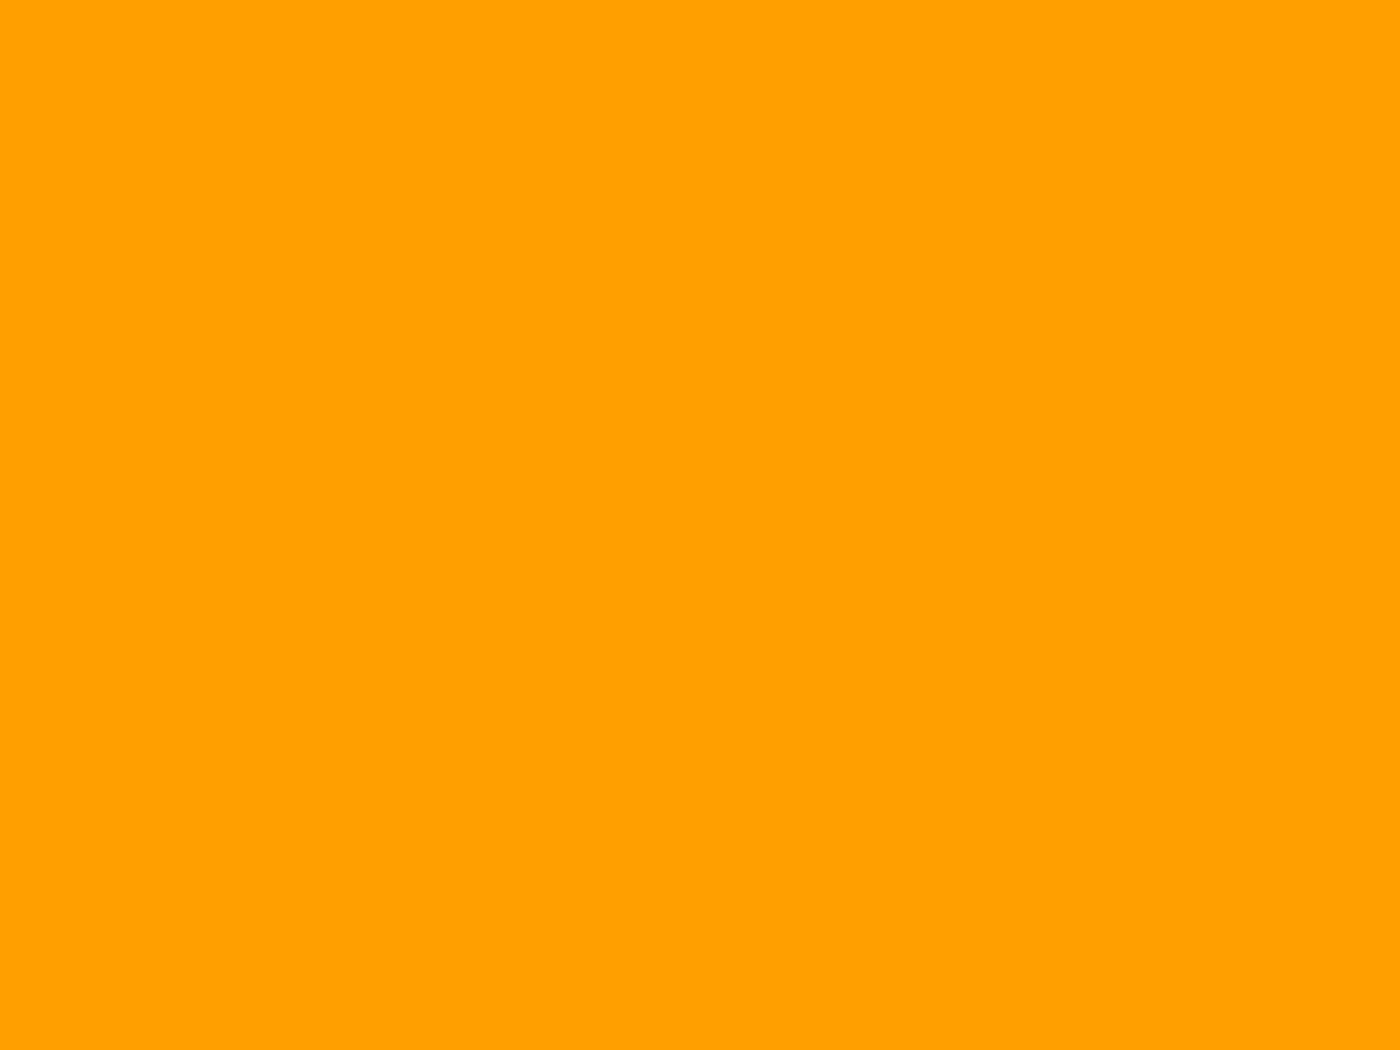 1400x1050 Orange Peel Solid Color Background